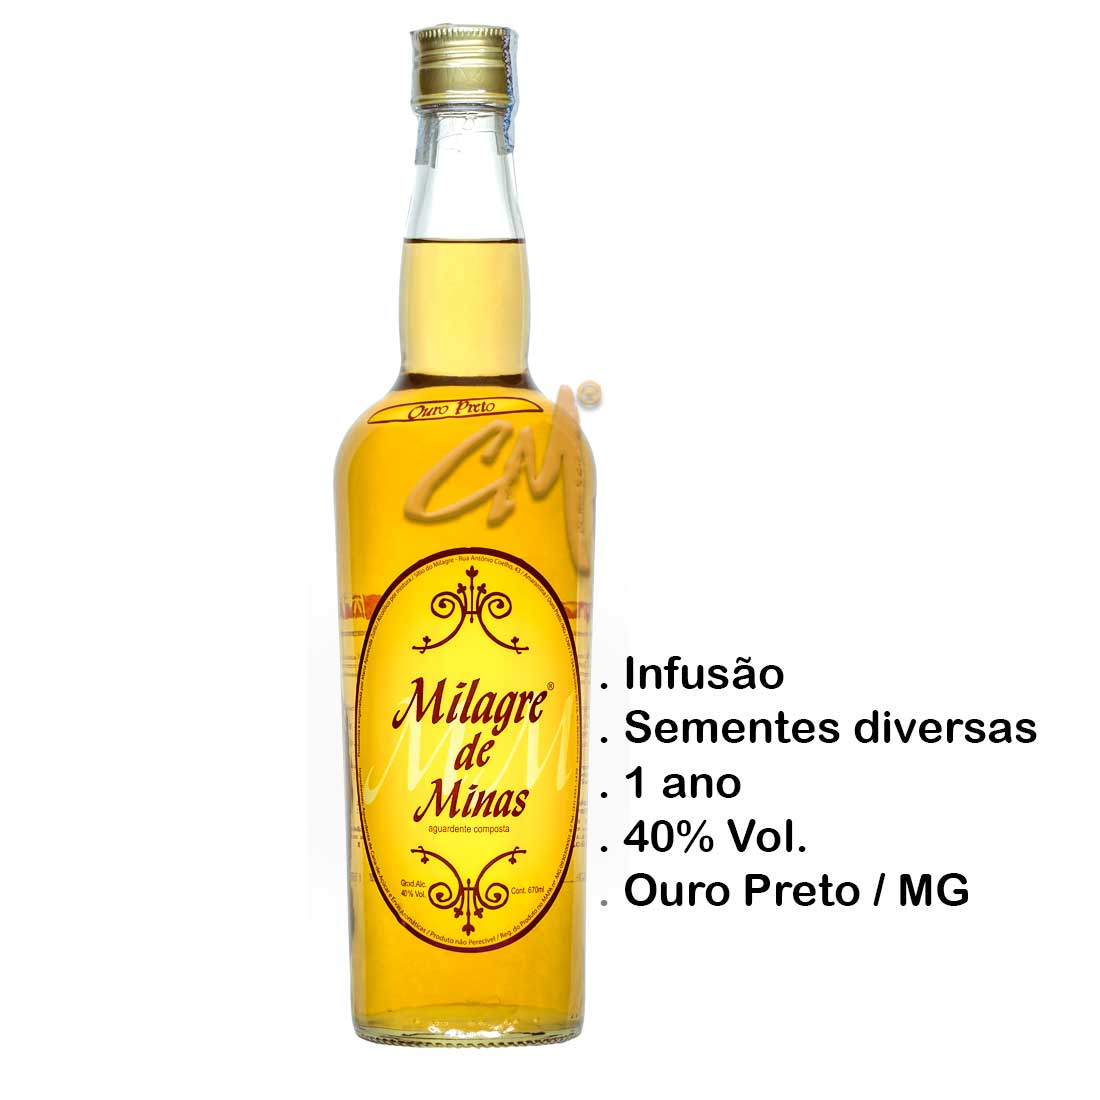 Cachaça Milagre de Minas 670 ml (Ouro Preto - MG)